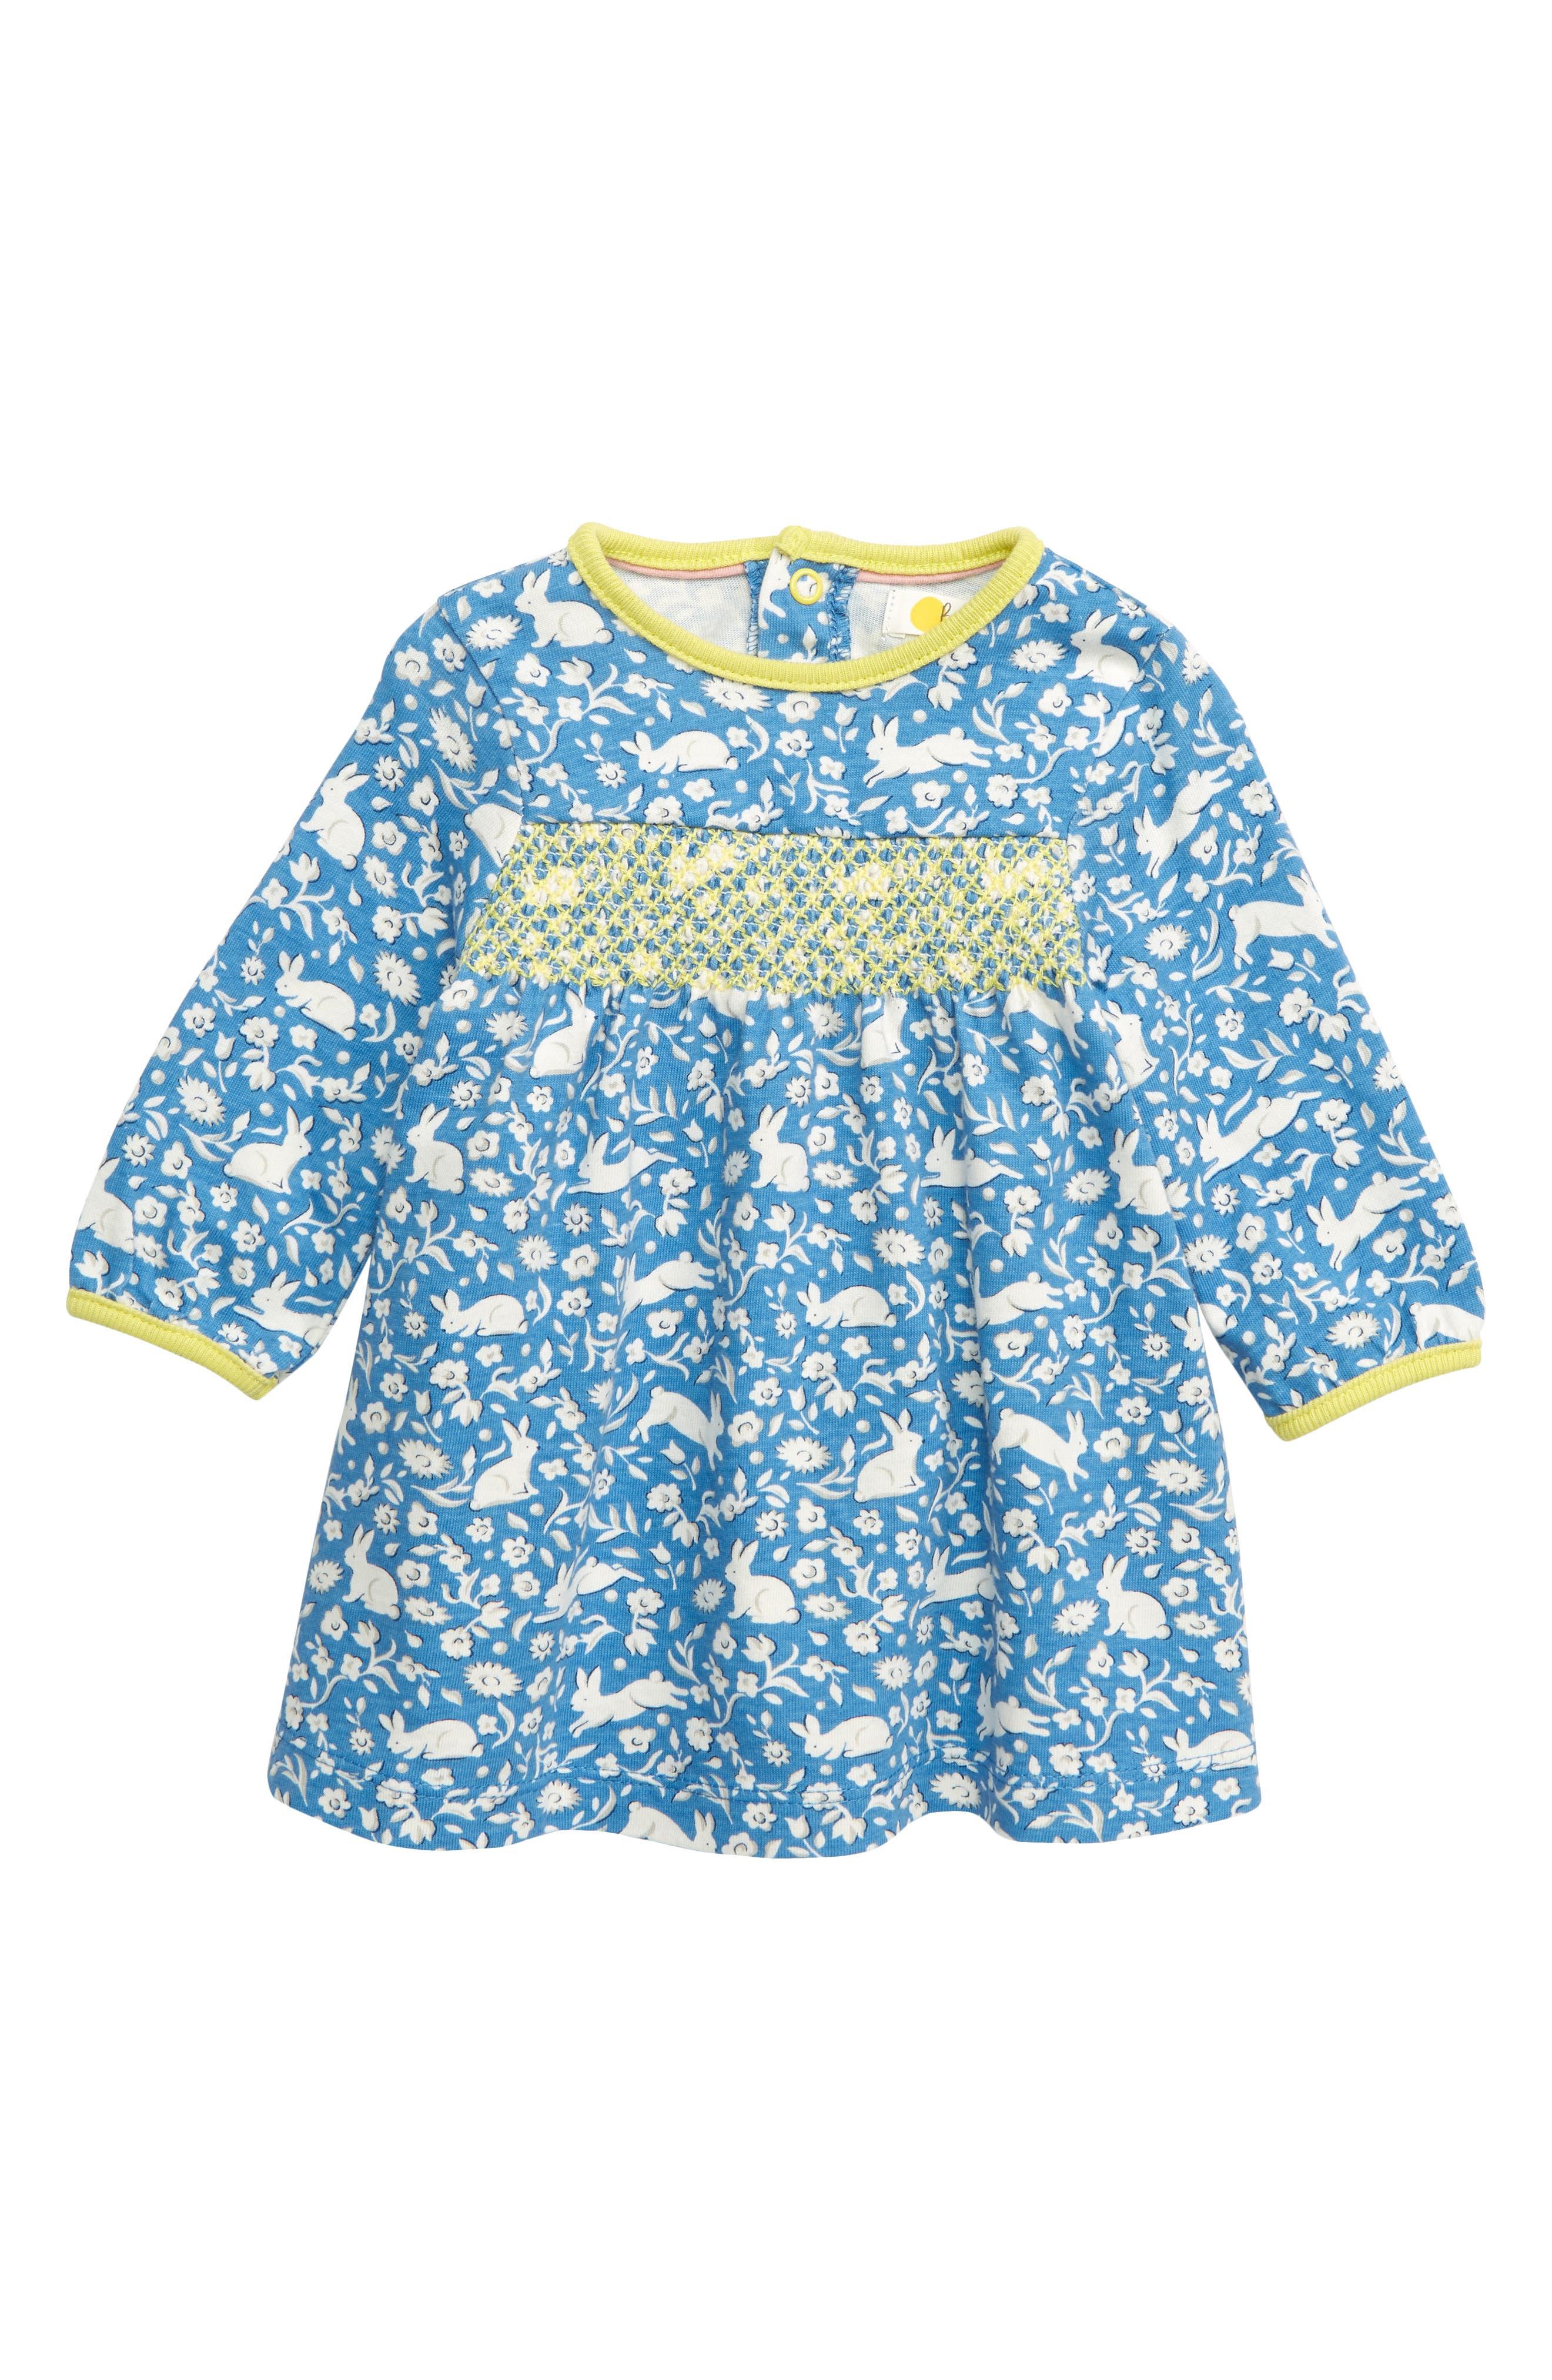 MINI BODEN Pretty Smocked Jersey Dress, Main, color, ELIZABETH BLUE WILD BUNNIES